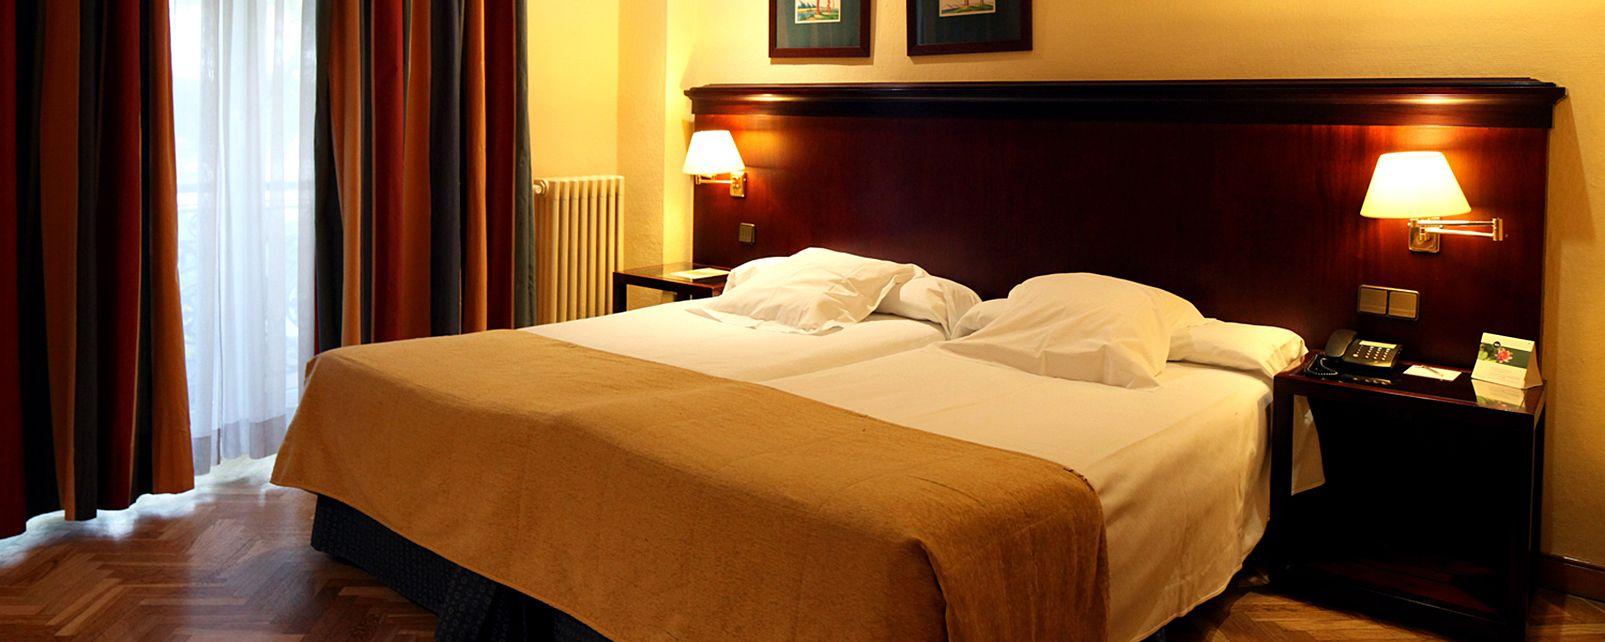 Hotel SH Inglés